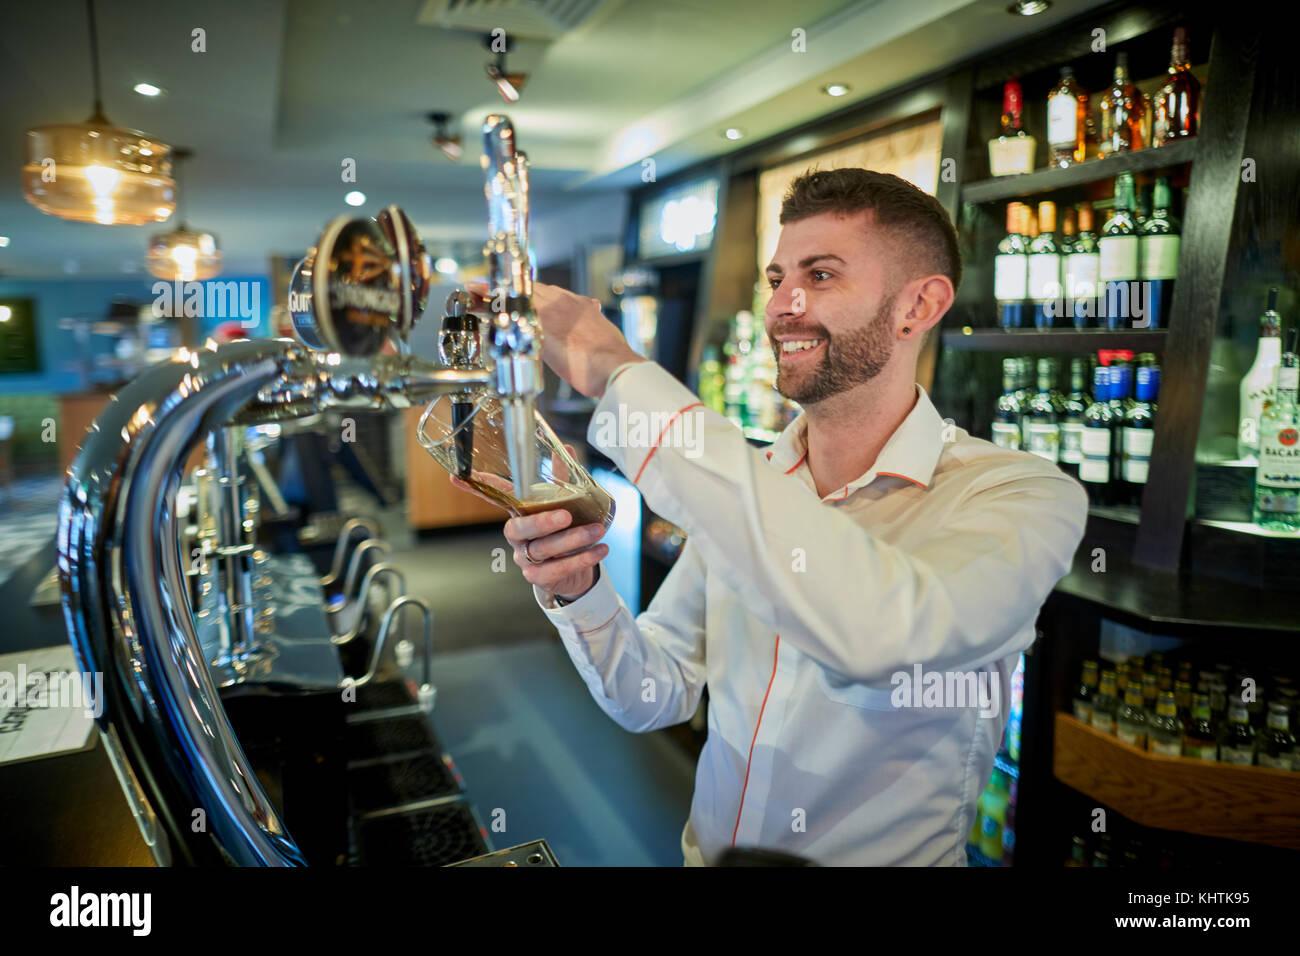 MARSTON'S, THE OLD DUKE pub barman pulling at pint - Stock Image